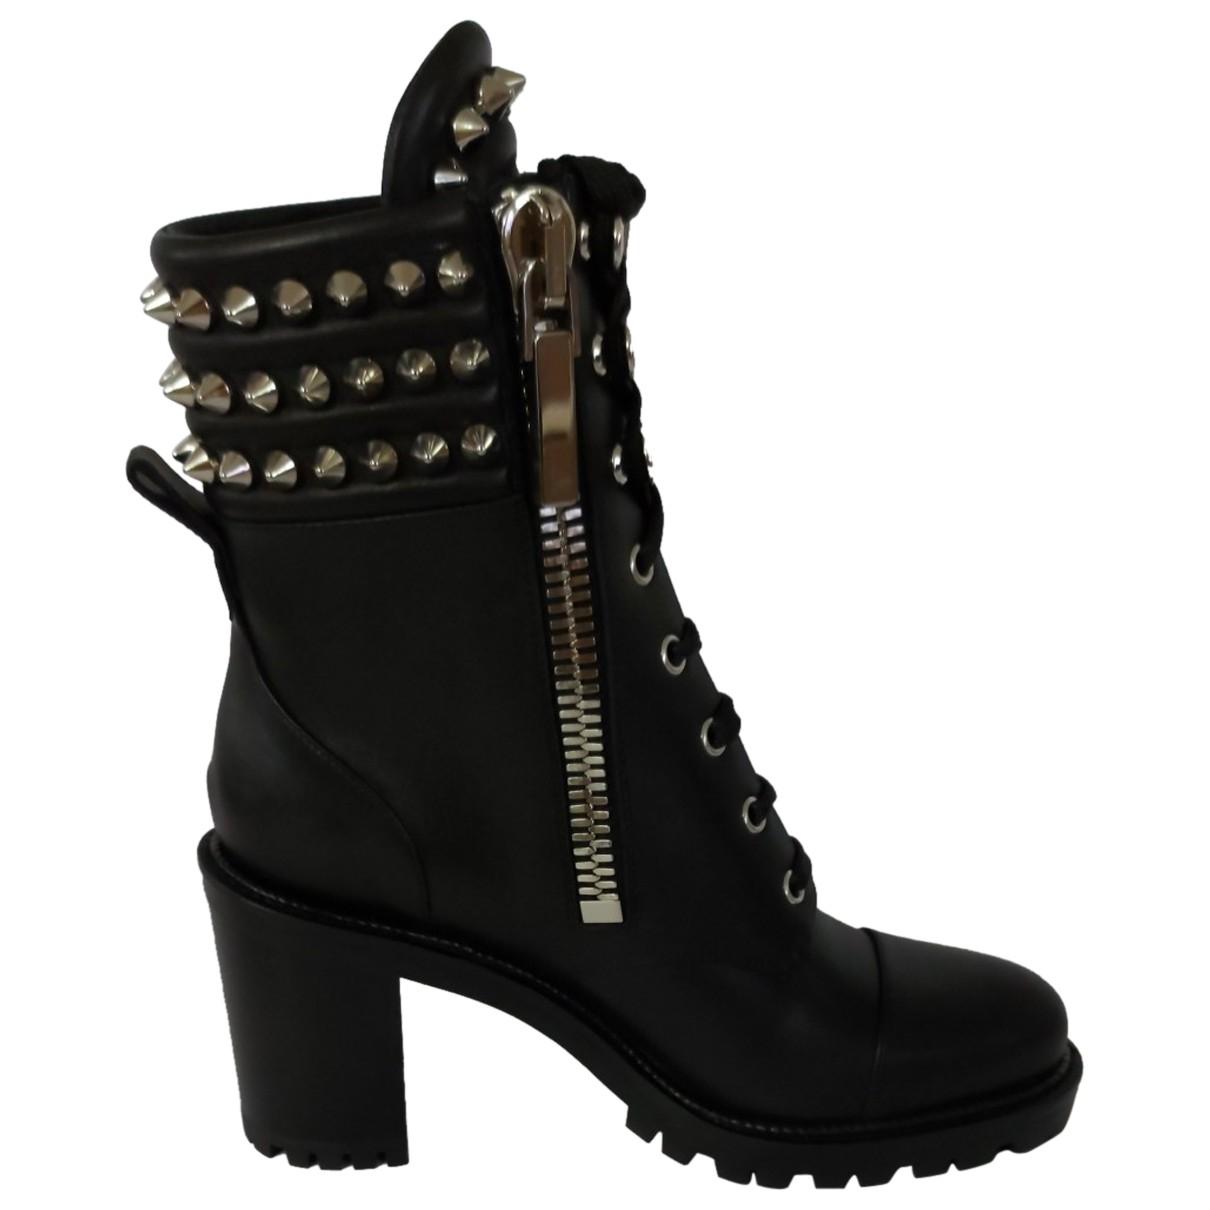 Christian Louboutin N Black Leather Boots for Women 37.5 EU